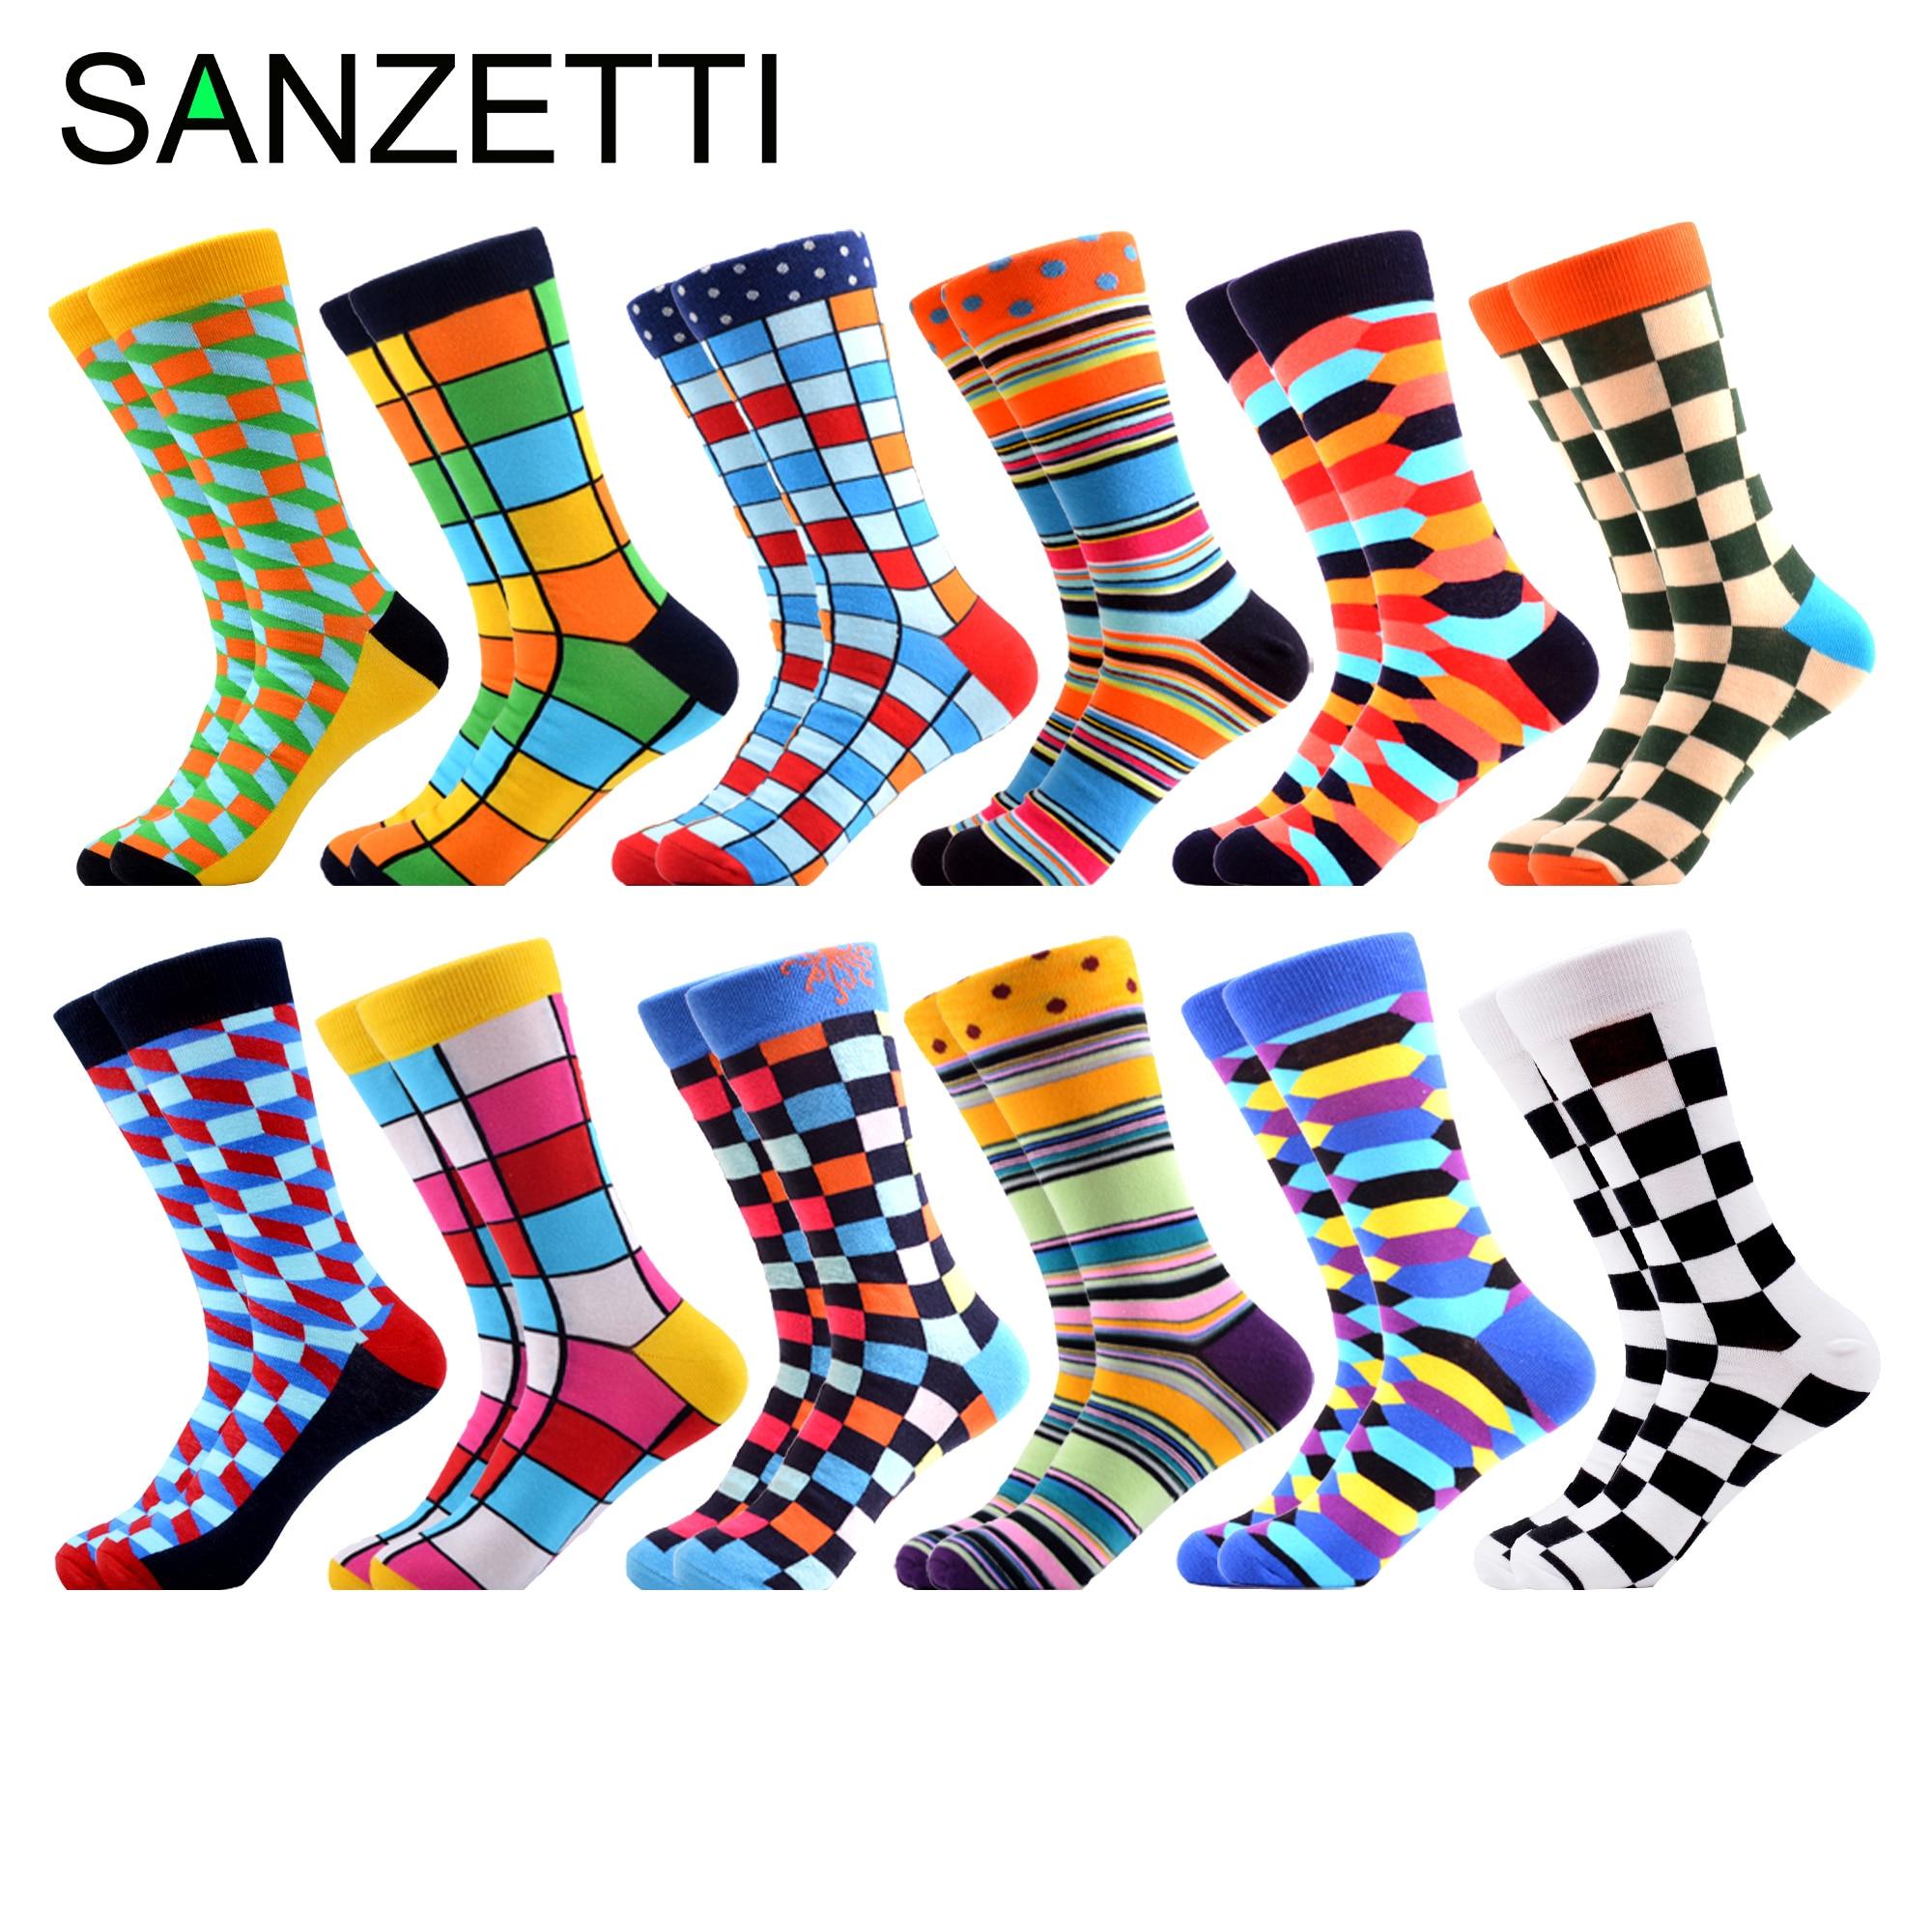 SANZETTI 12 Pairs/lot Men's Colorful Argyle Combed Cotton Socks Funny Striped Dot Multi Set Dress Casual Crew Socks Happy Socks